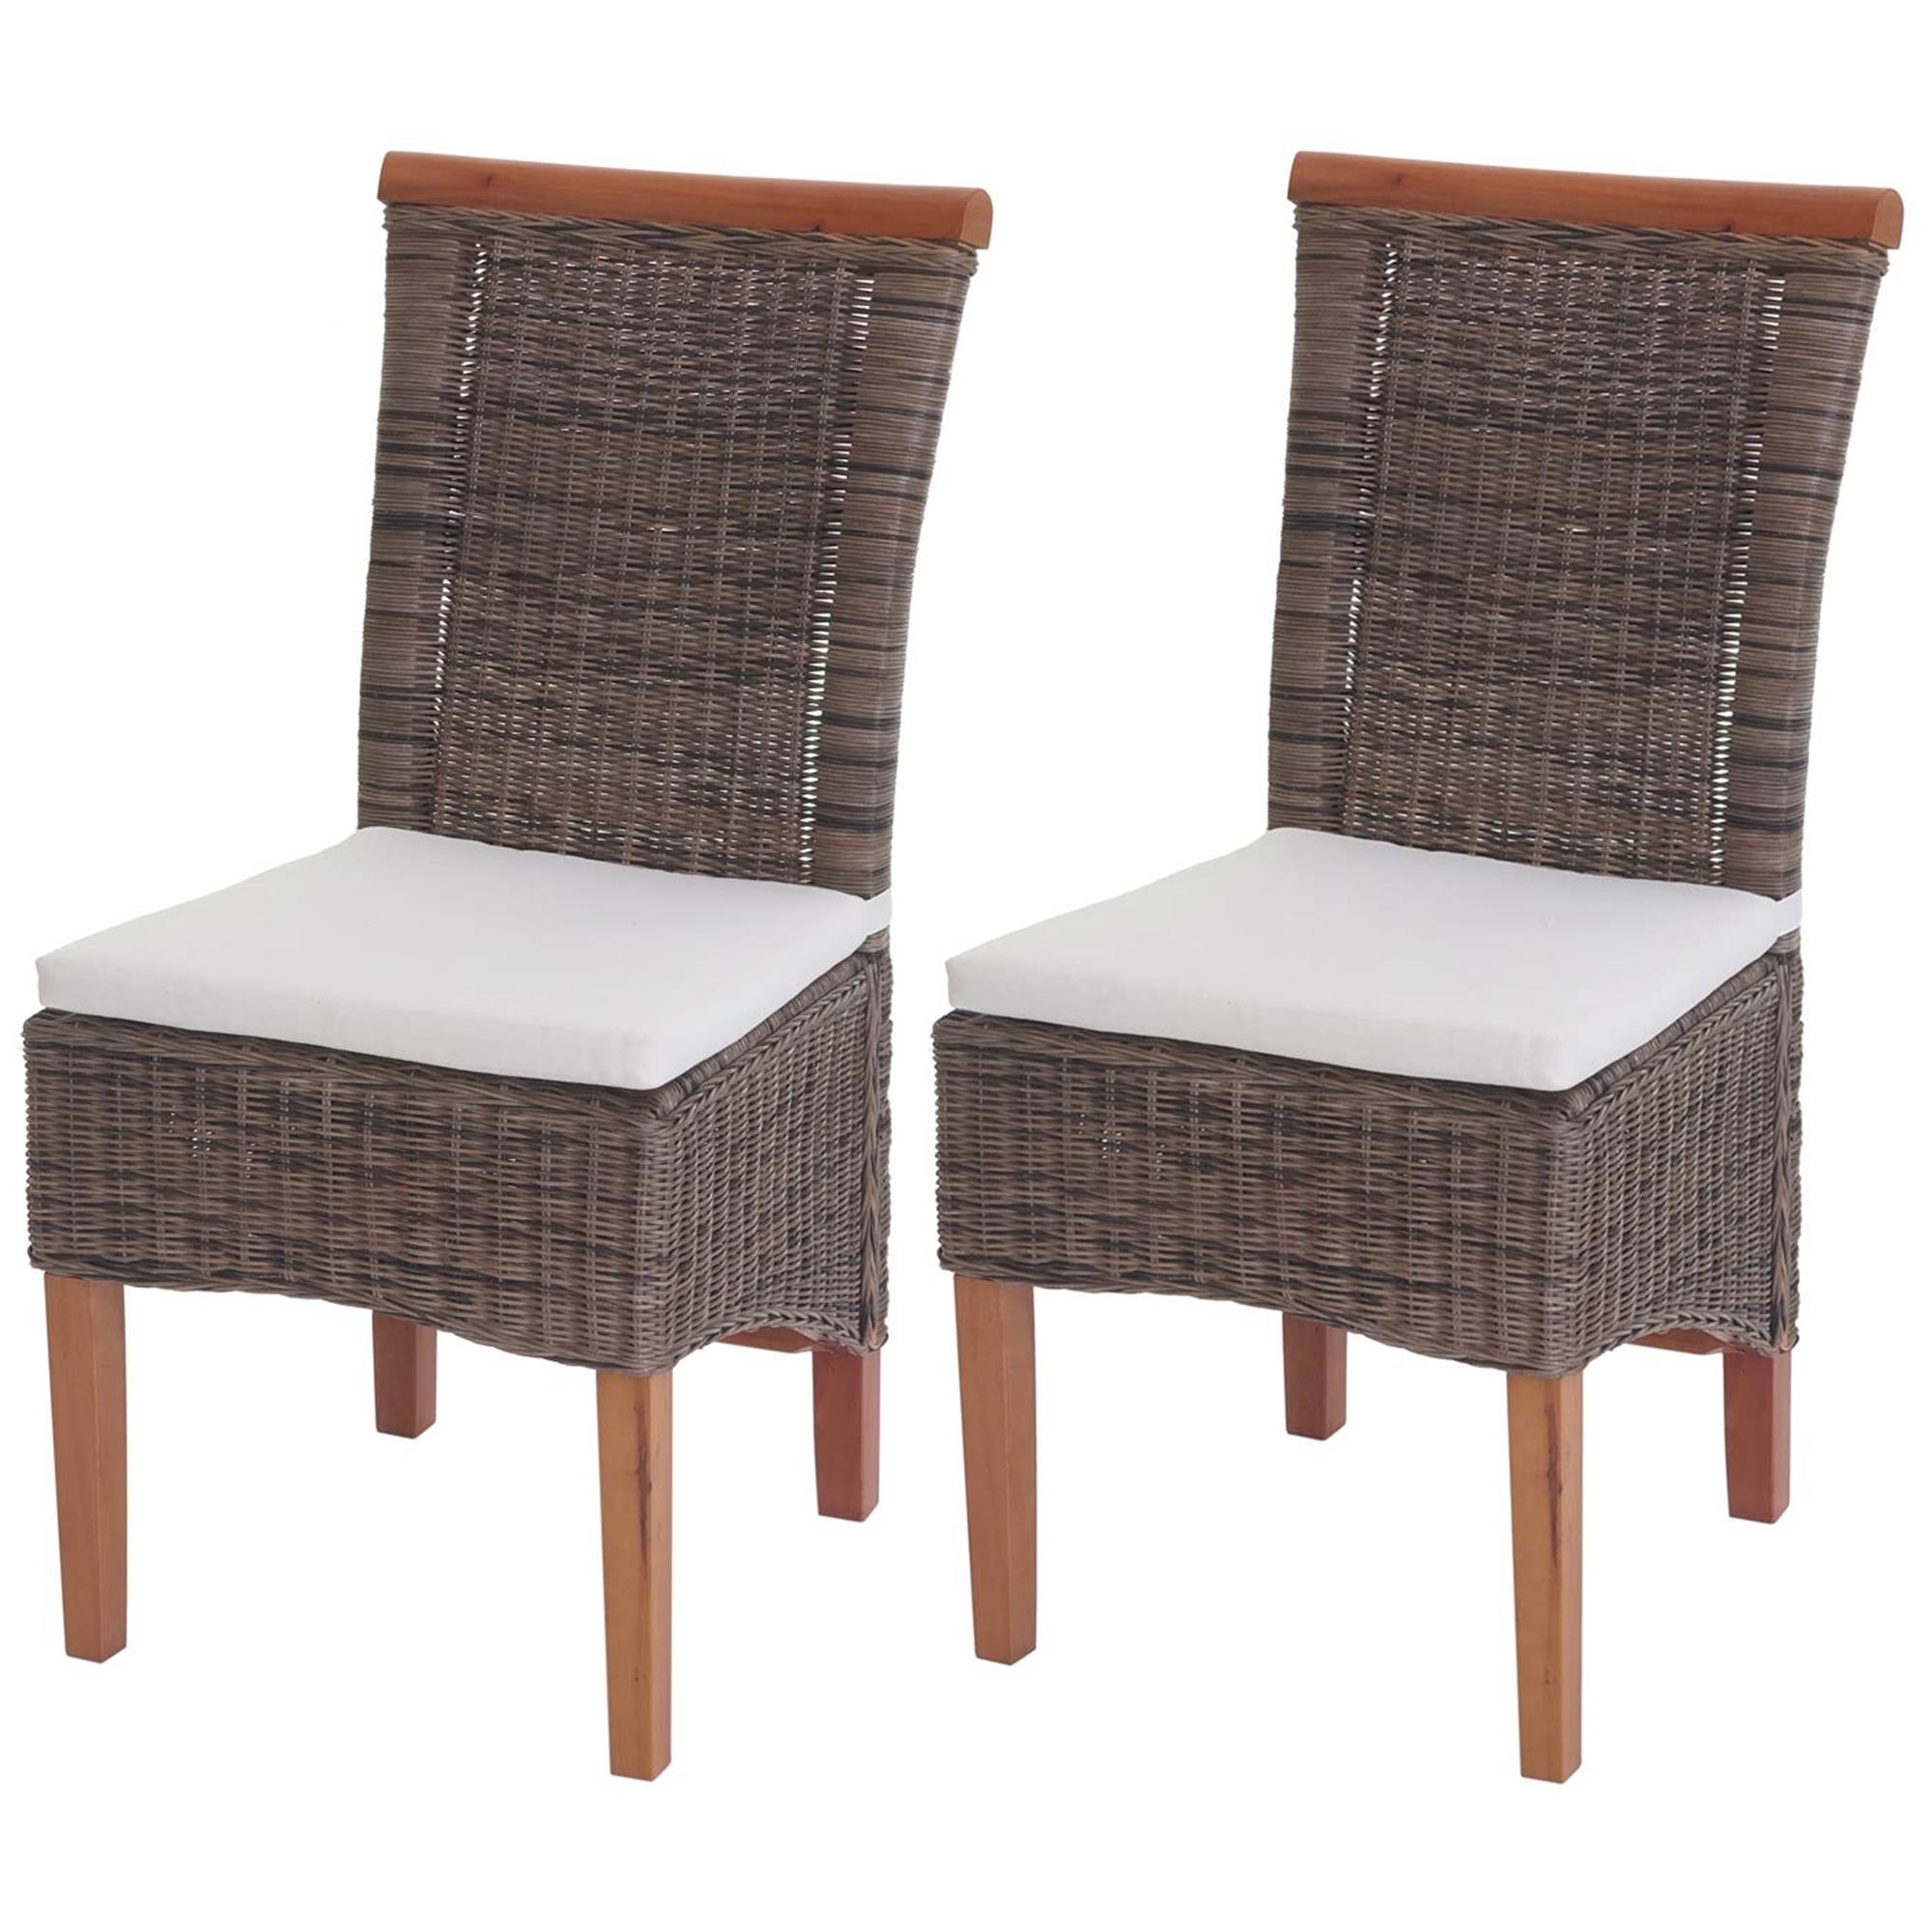 Lote 2 sillas comedor o jardin sedri en mimbre marr n for Sillas mimbre comedor